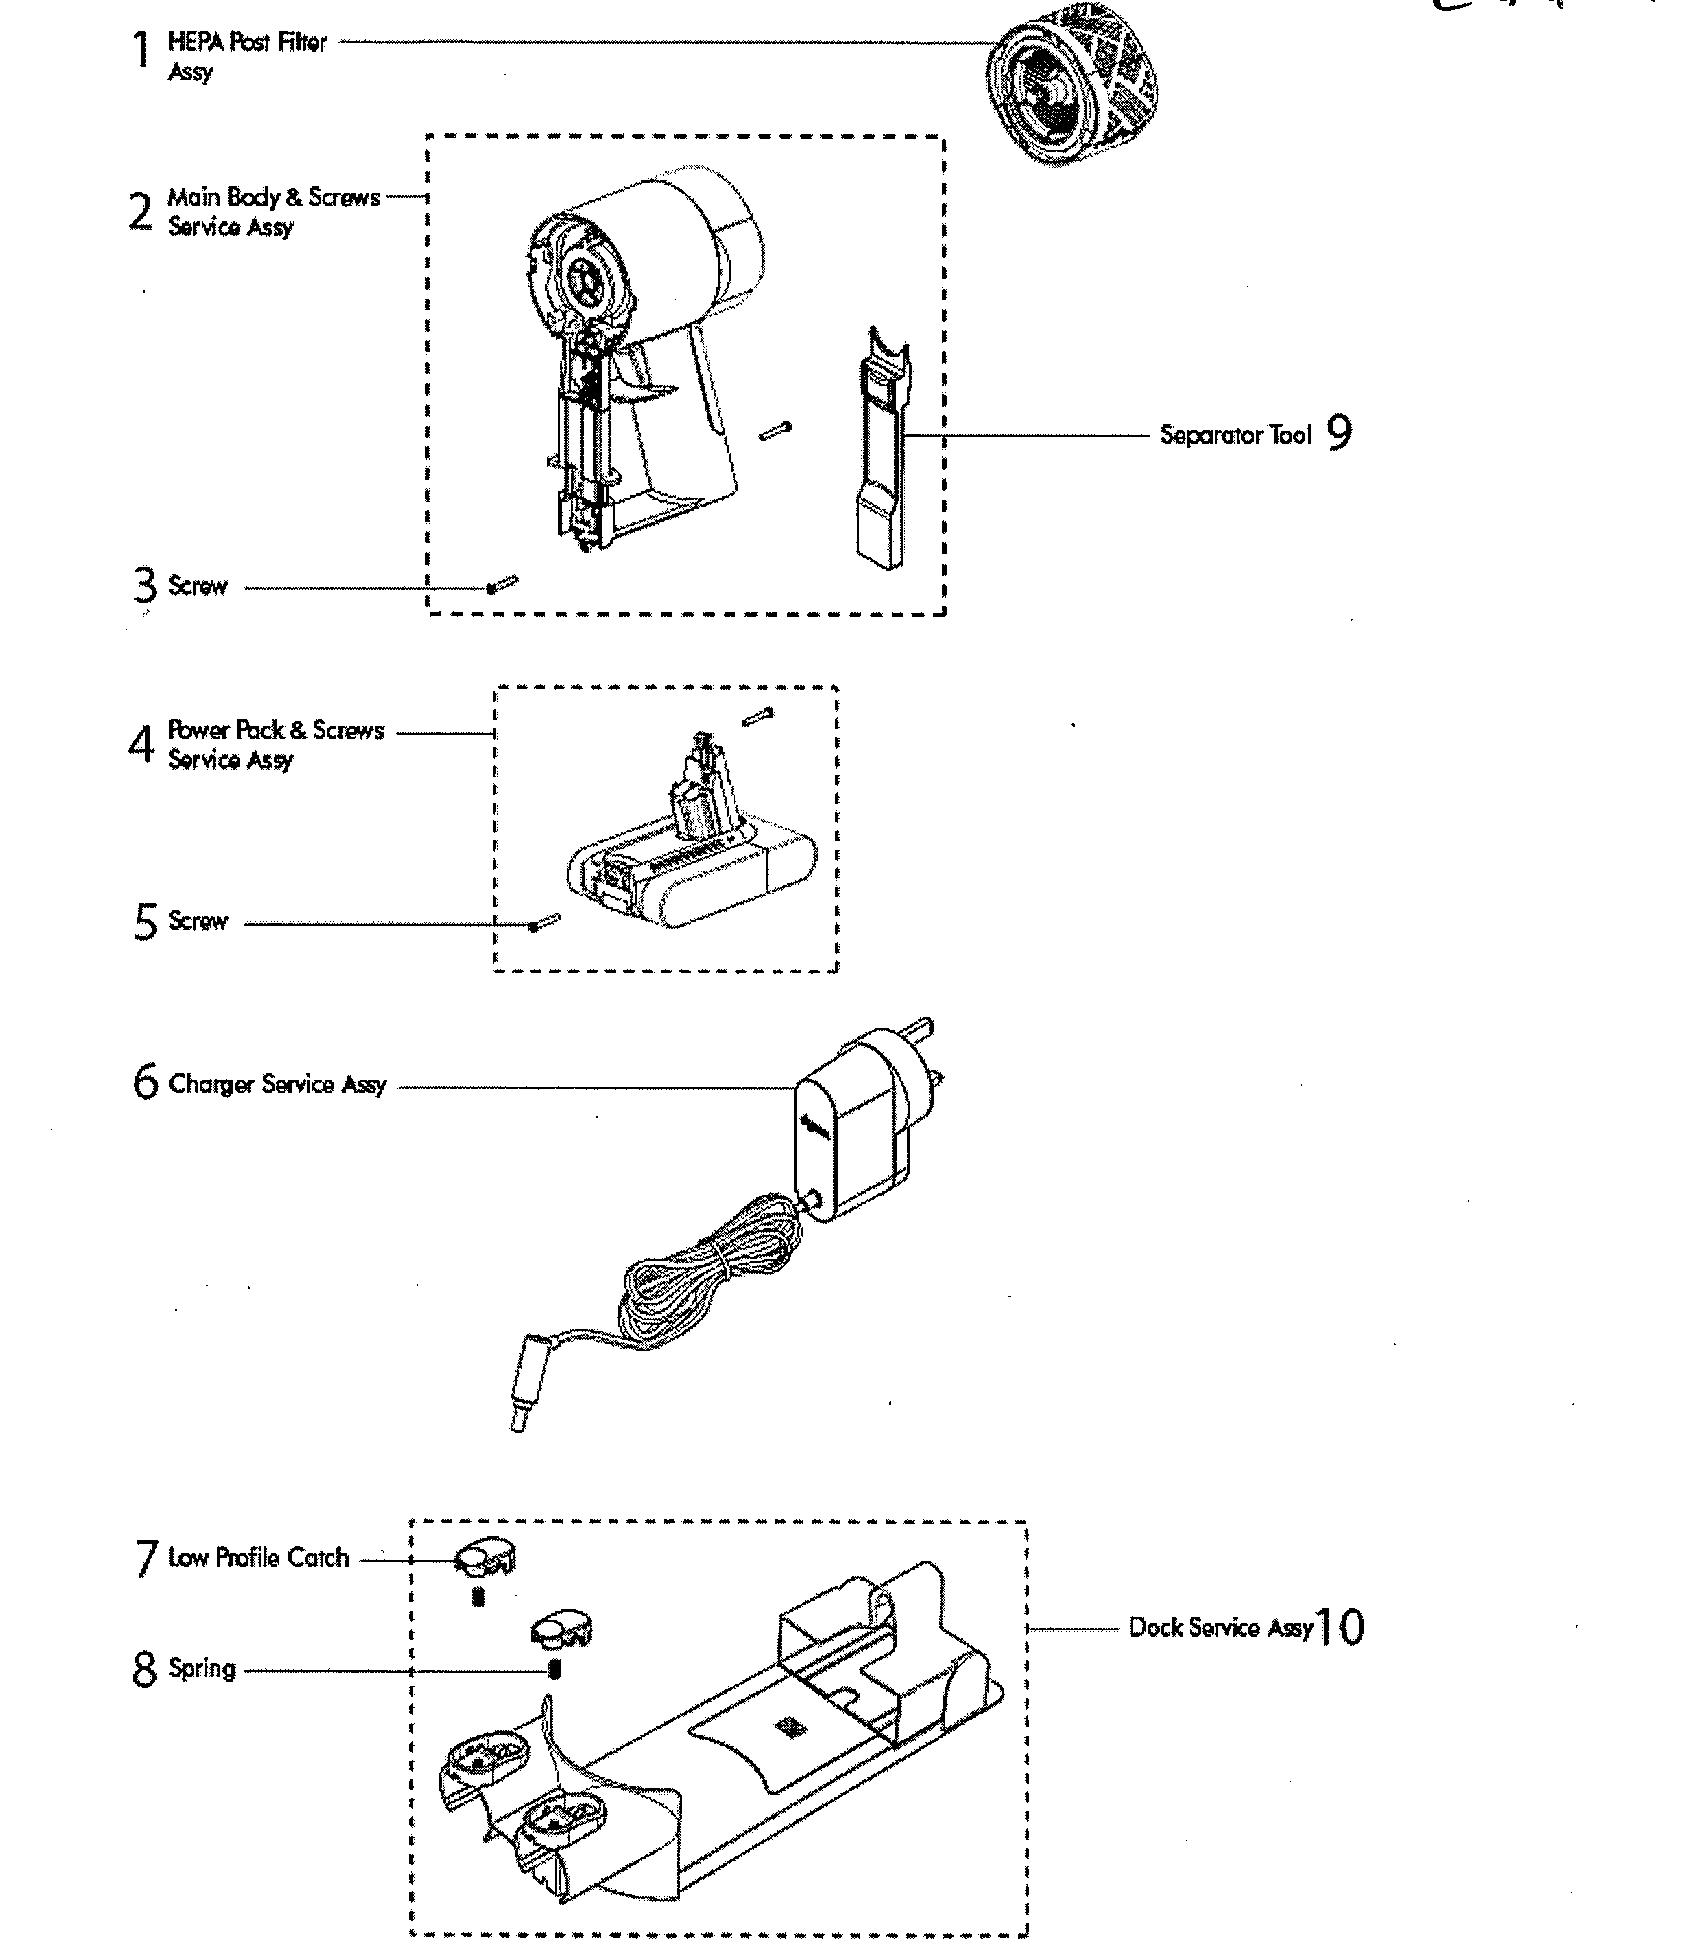 Dyson model V6-SV09 vacuum, hand-held genuine parts